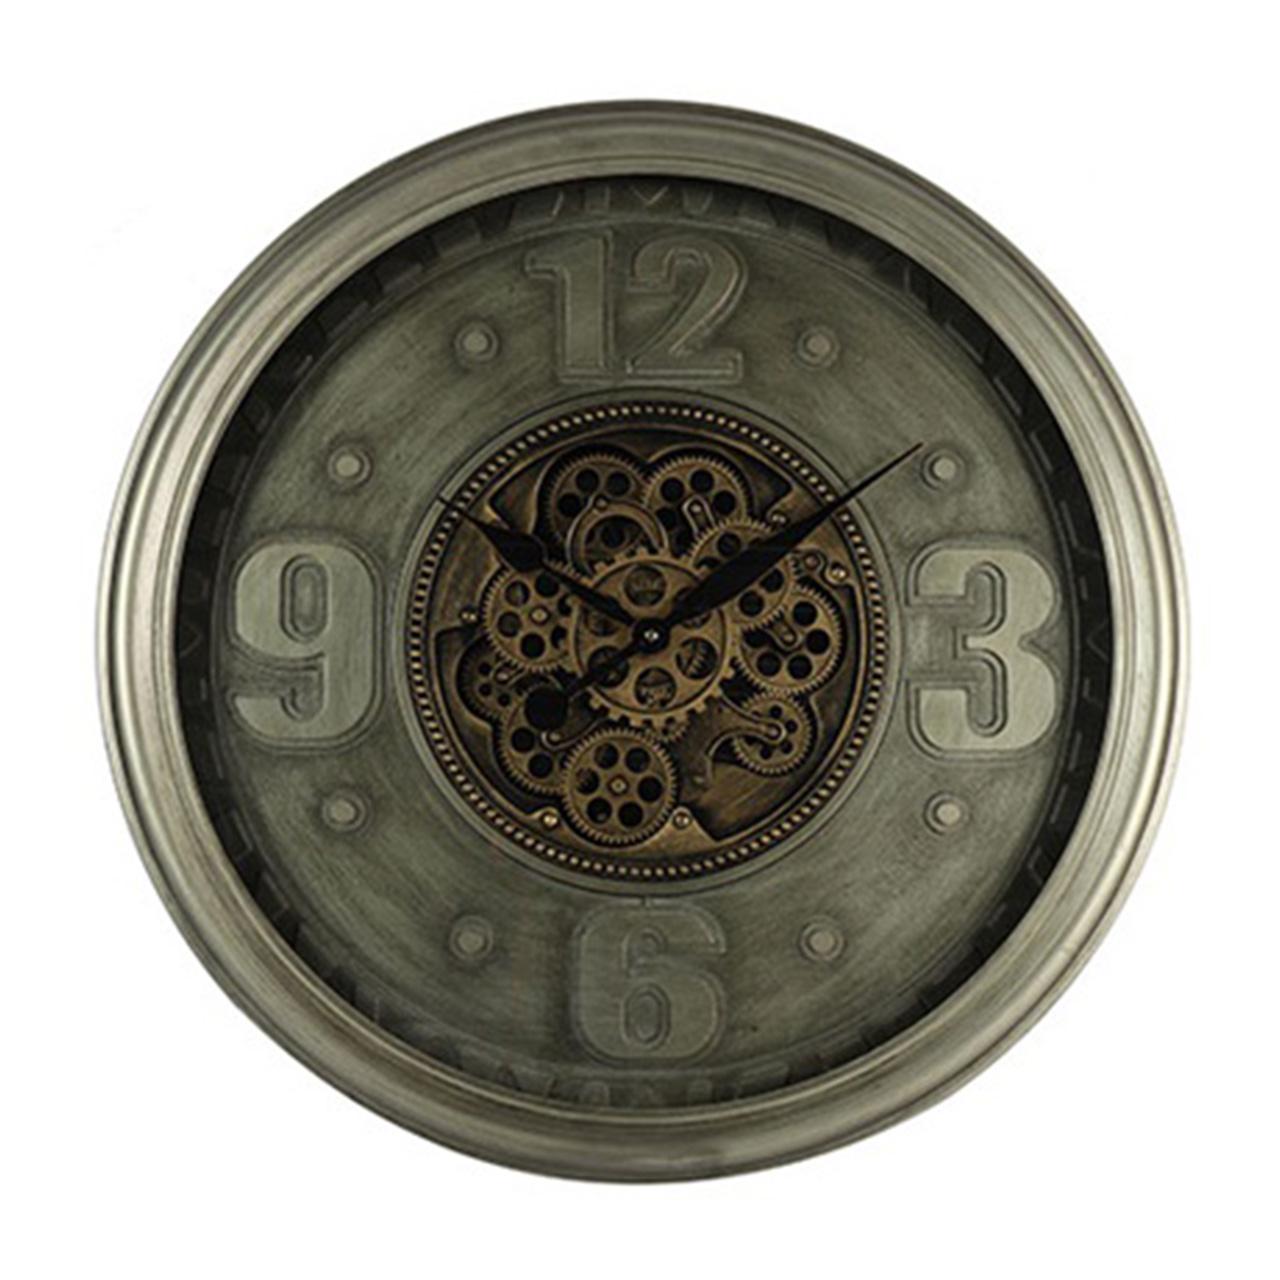 Uhr Bern S